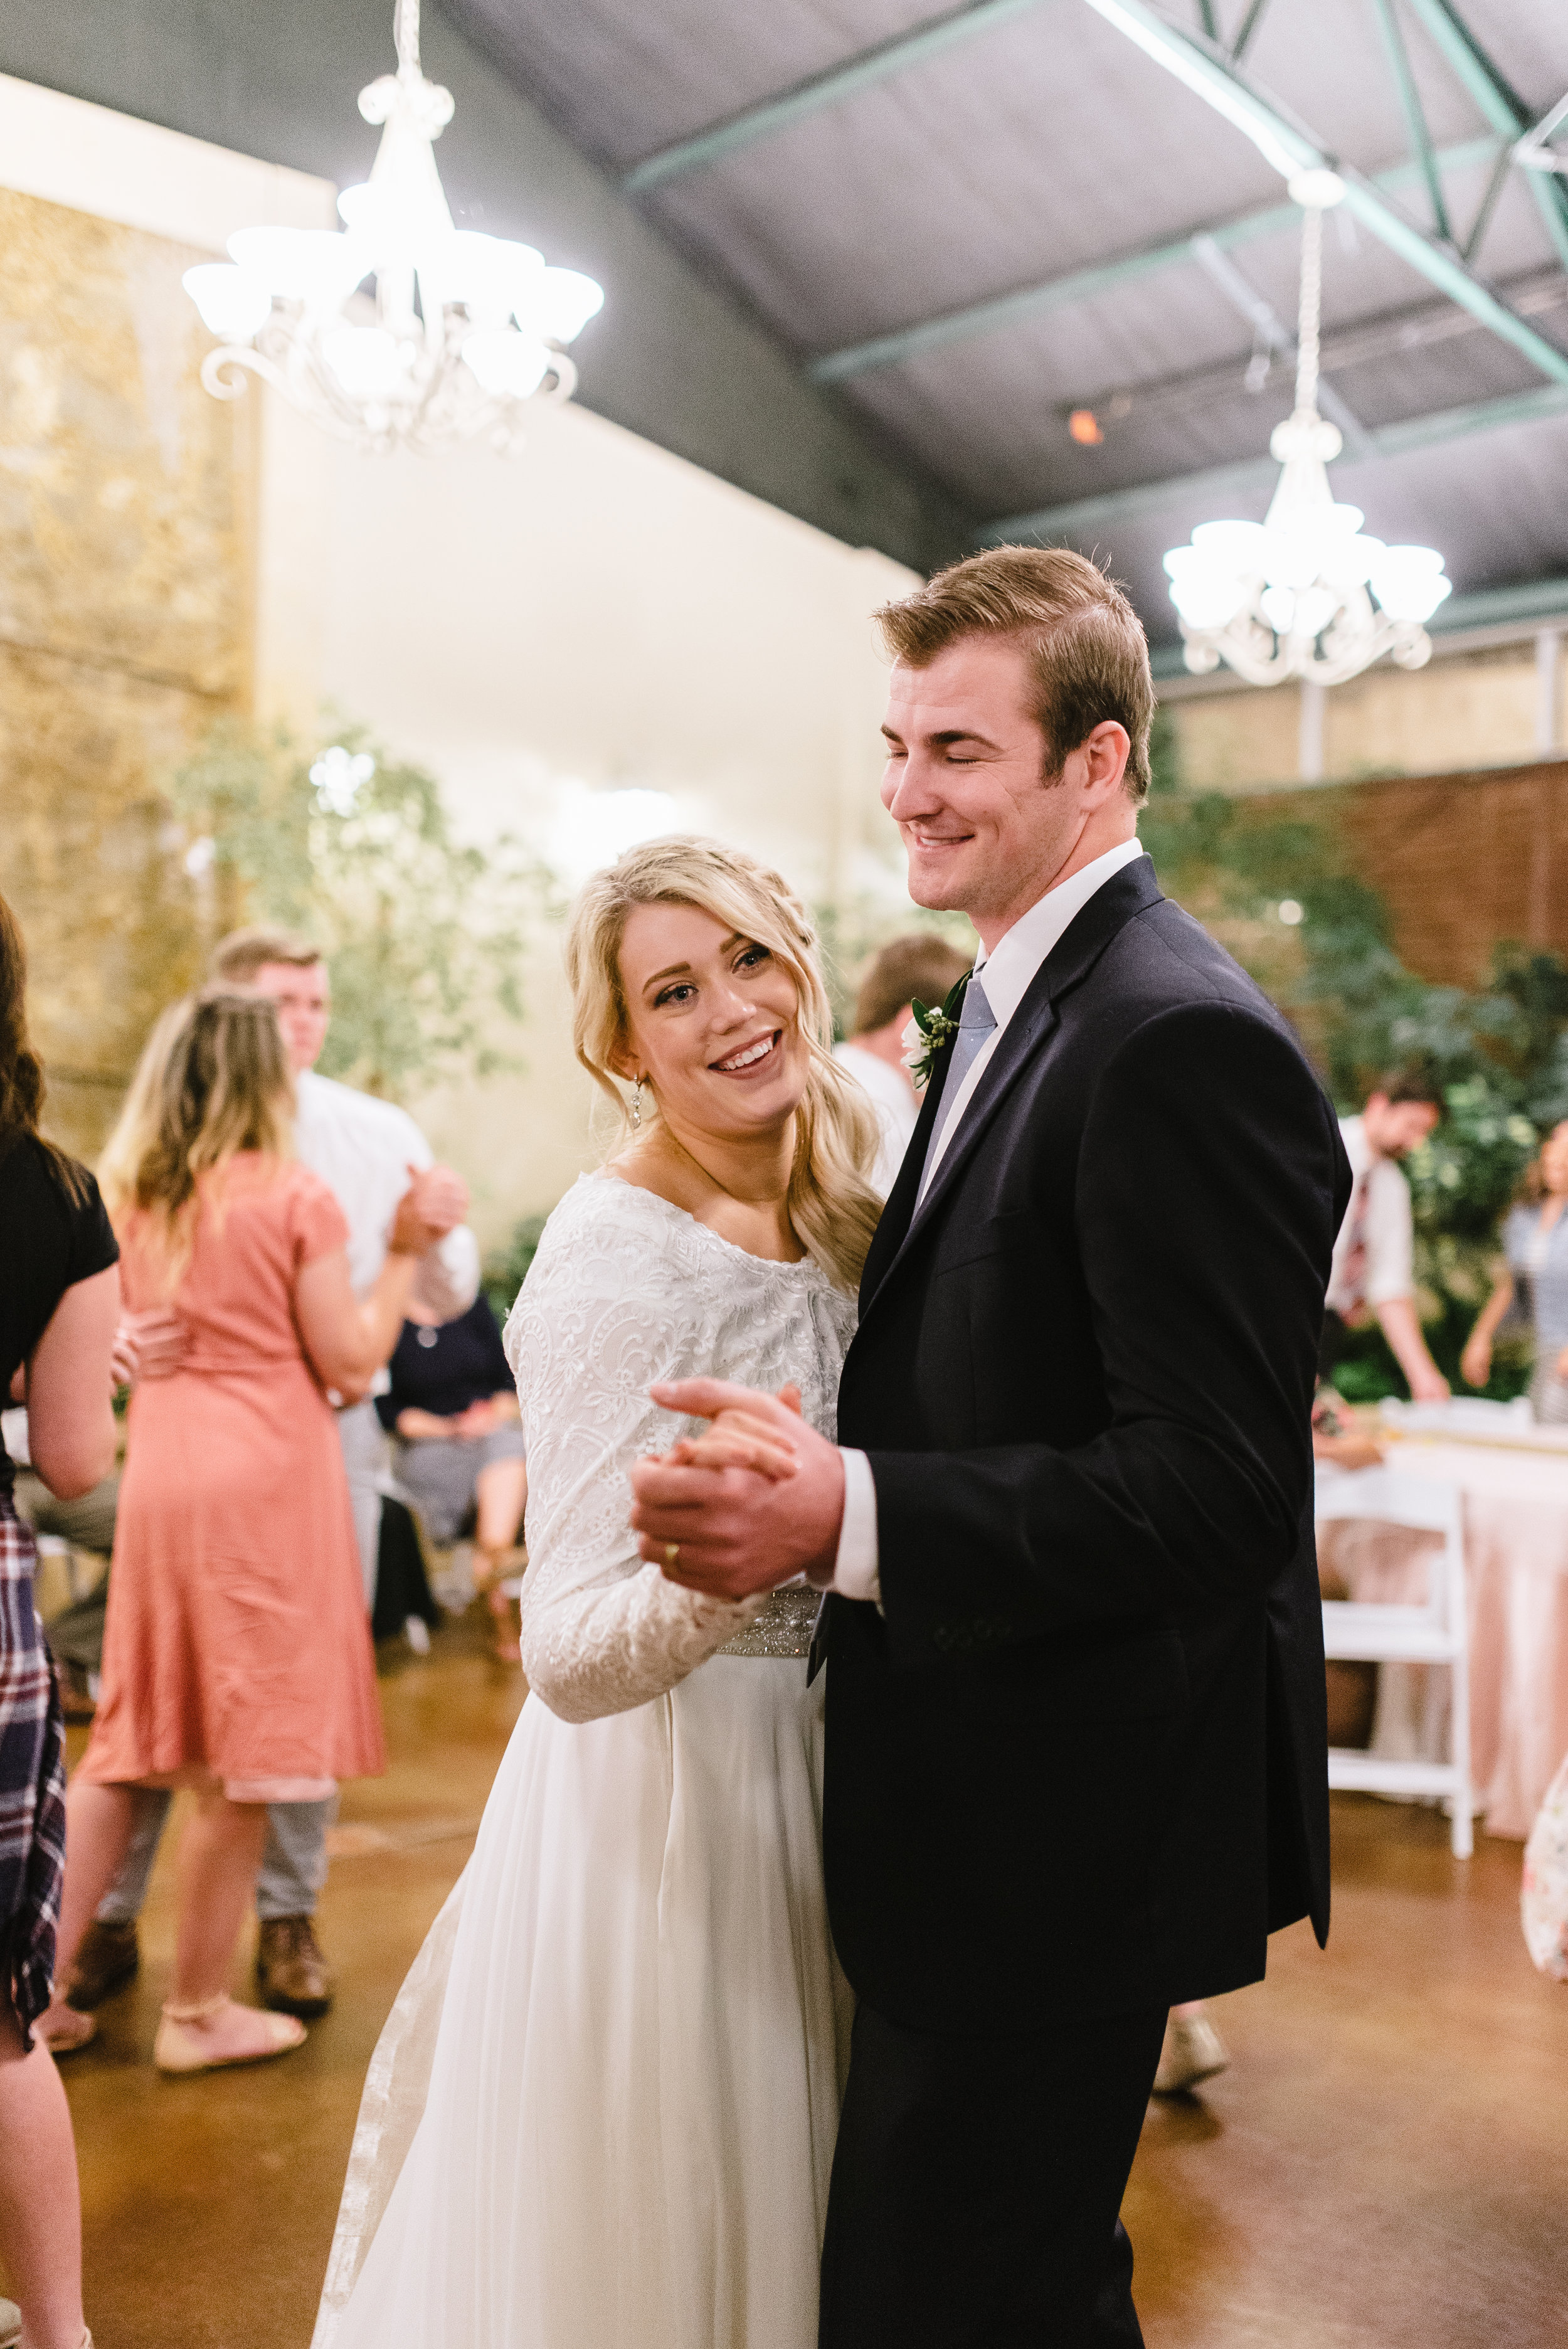 Taylor + Joe Wedding- Reception -248.jpg